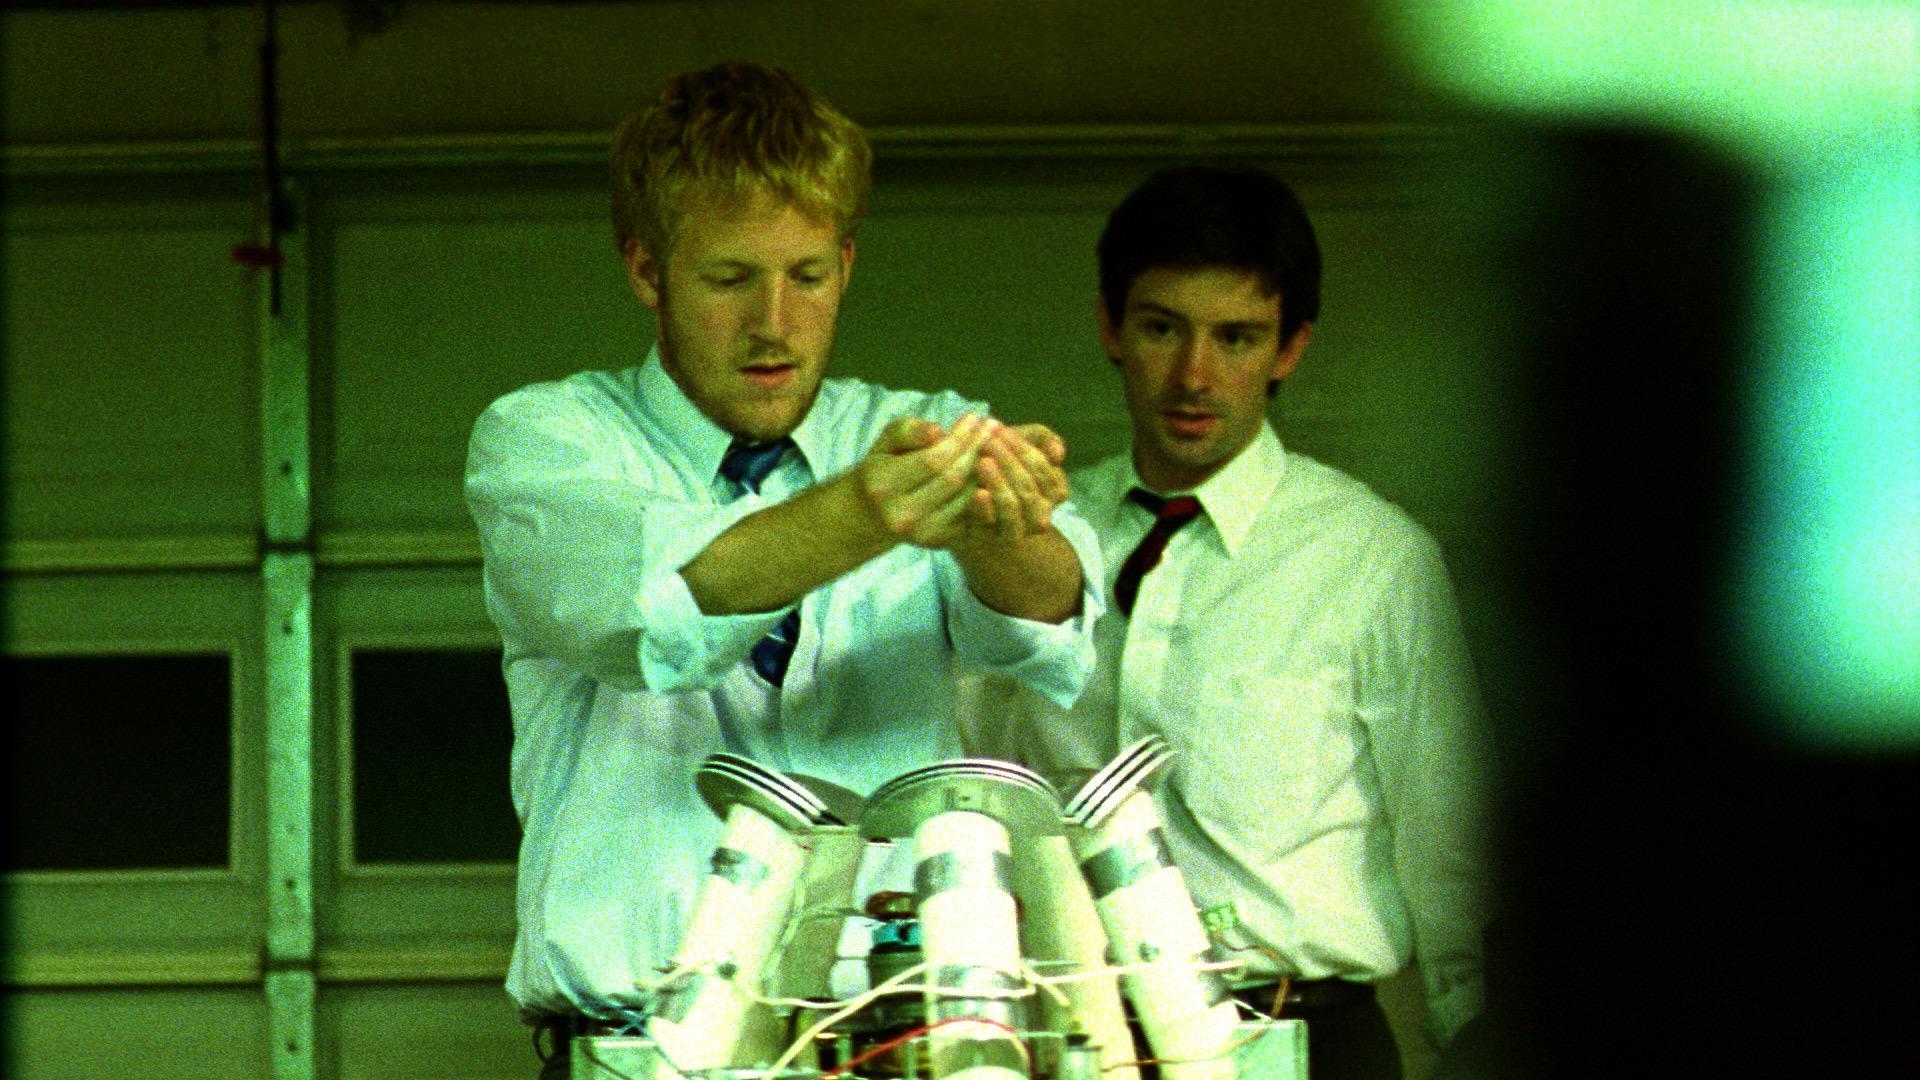 primer featured - فیلمهای علمی تخیلی جالب و چالش برانگیز